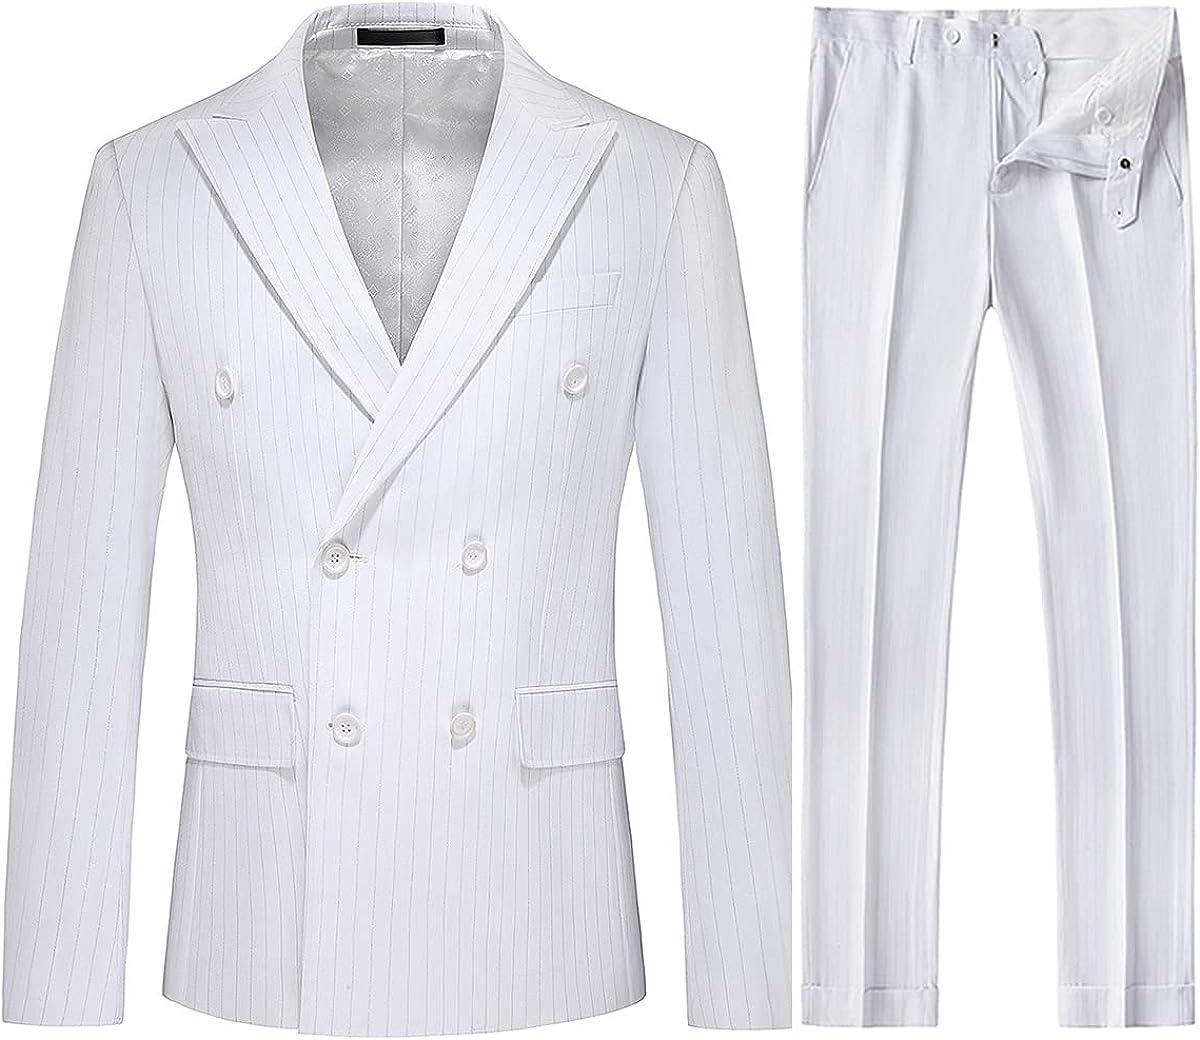 Mens Double Breasted Suits Slim Fit Pinstripe 3 Piece Set Tuxedo Blazer Jackets Vest & Pants Wedding Casual